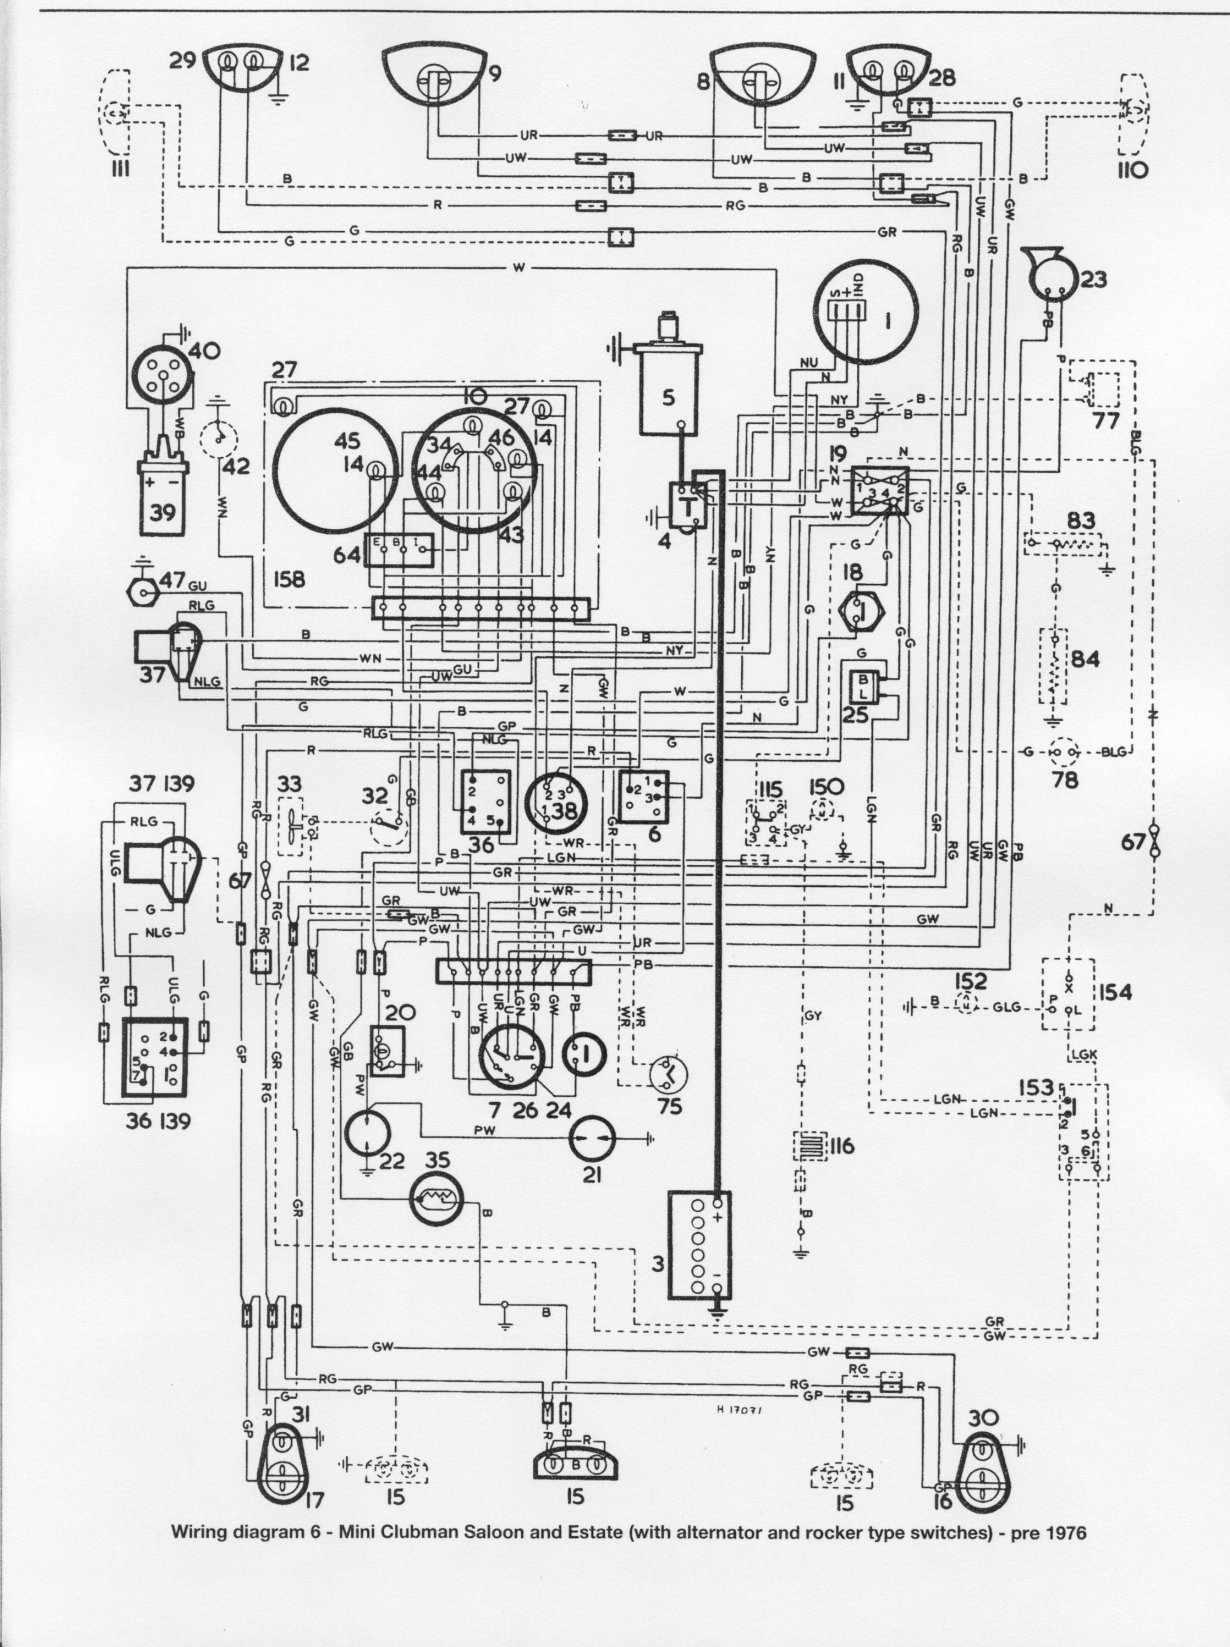 1990 mini cooper wiring diagram wiring diagram user 1990 mini cooper wiring diagram wiring diagrams konsult [ 1230 x 1647 Pixel ]